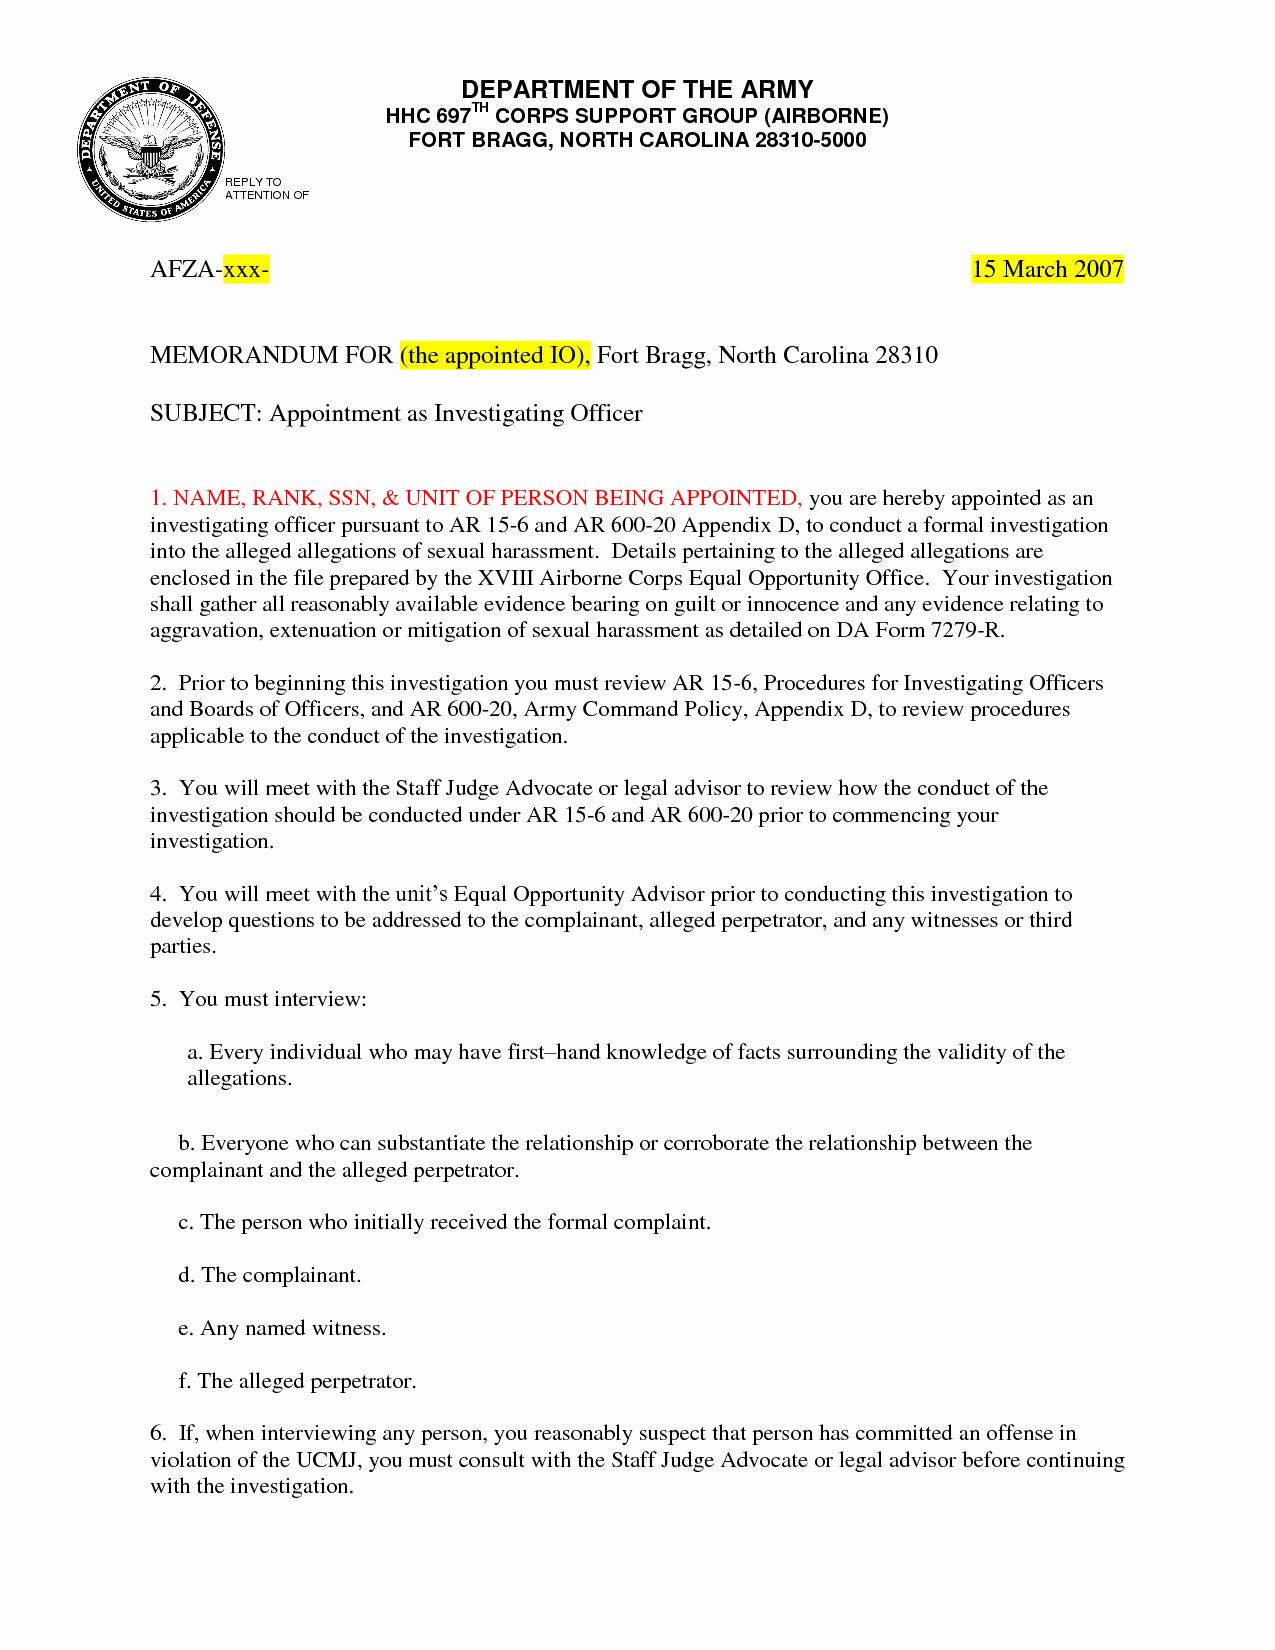 Army Memorandum for Record Template New Army Memorandum Template